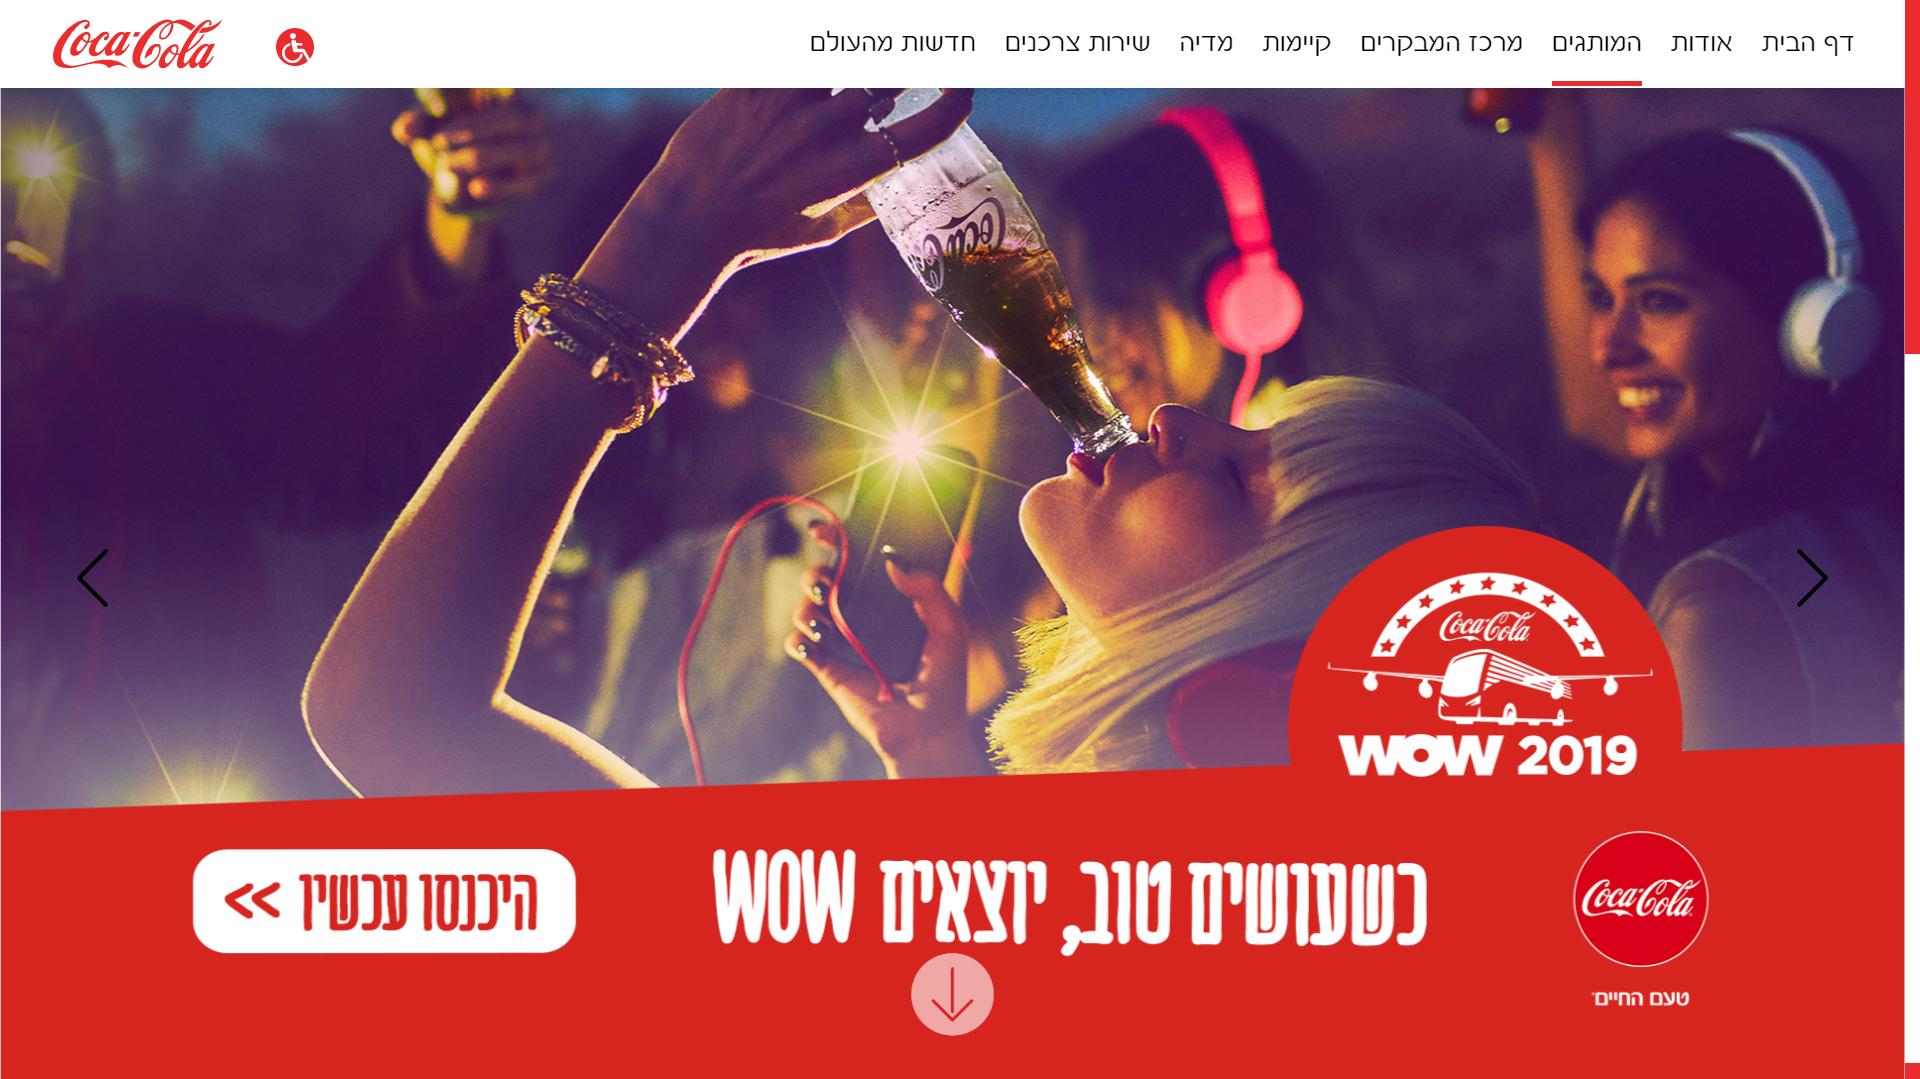 Coca Cola, Manufacturer in Bnei Brak, Israel